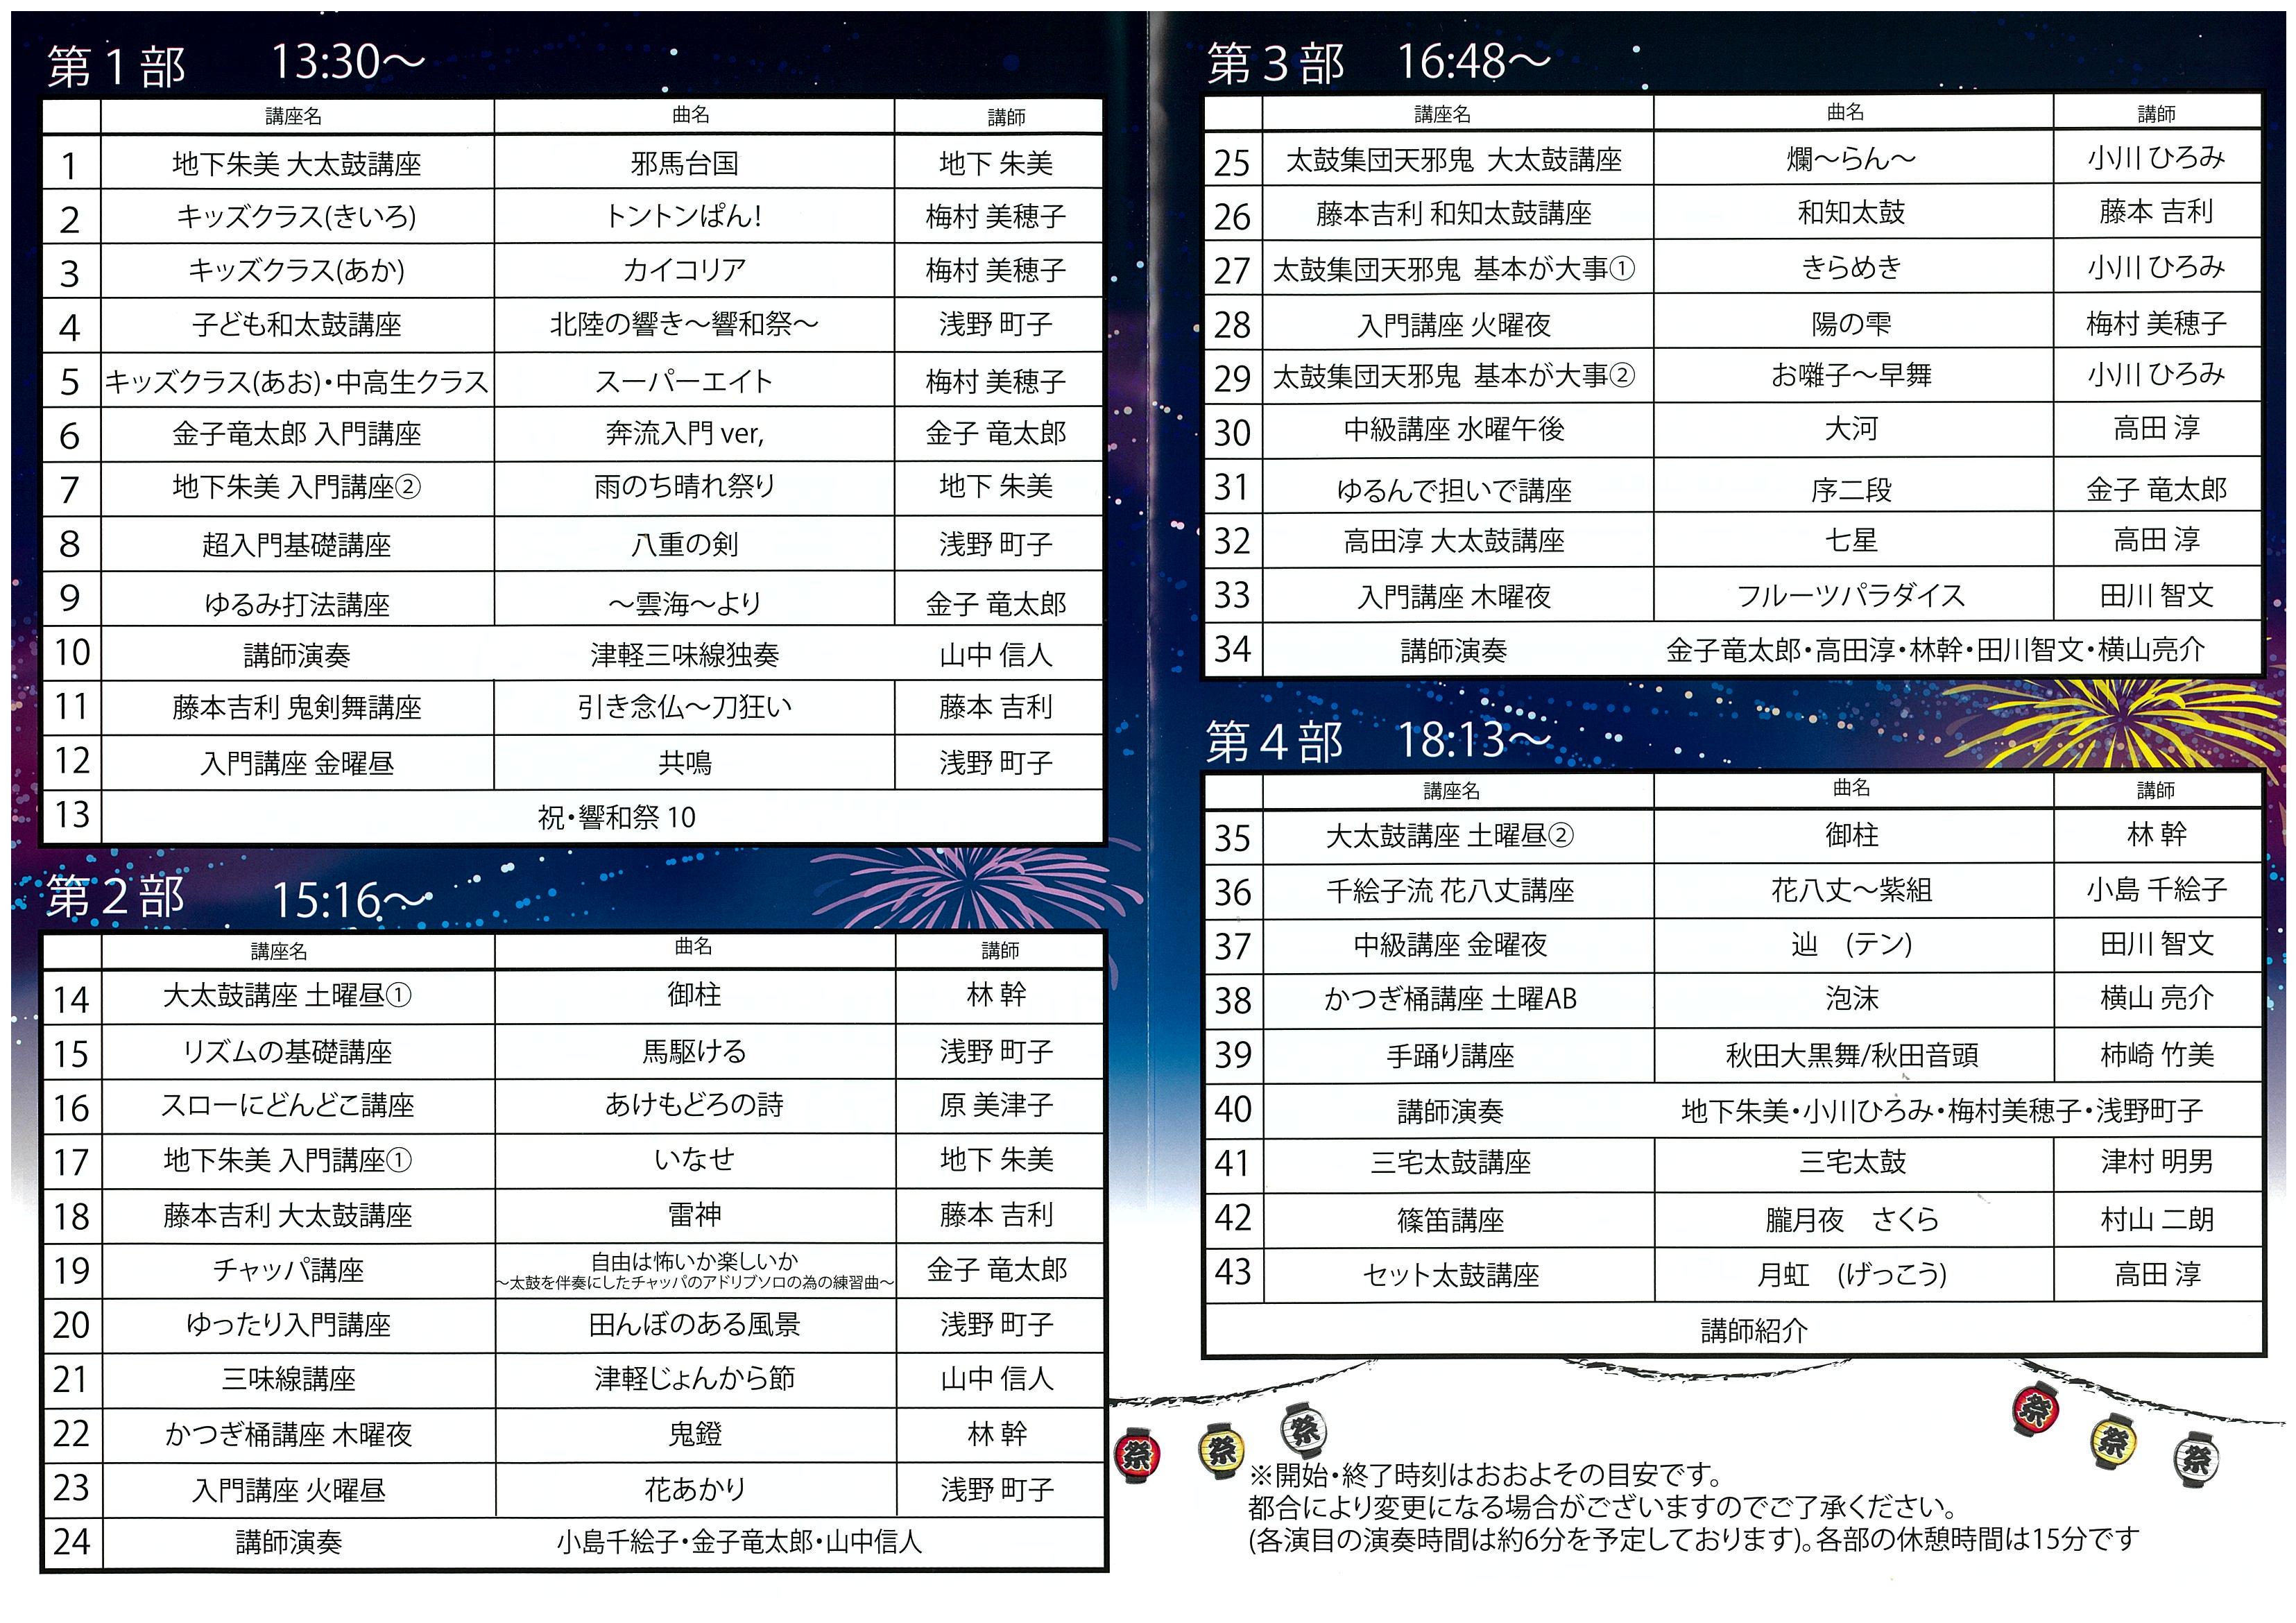 http://www.asano.jp/network/20180821170040-0001.jpg